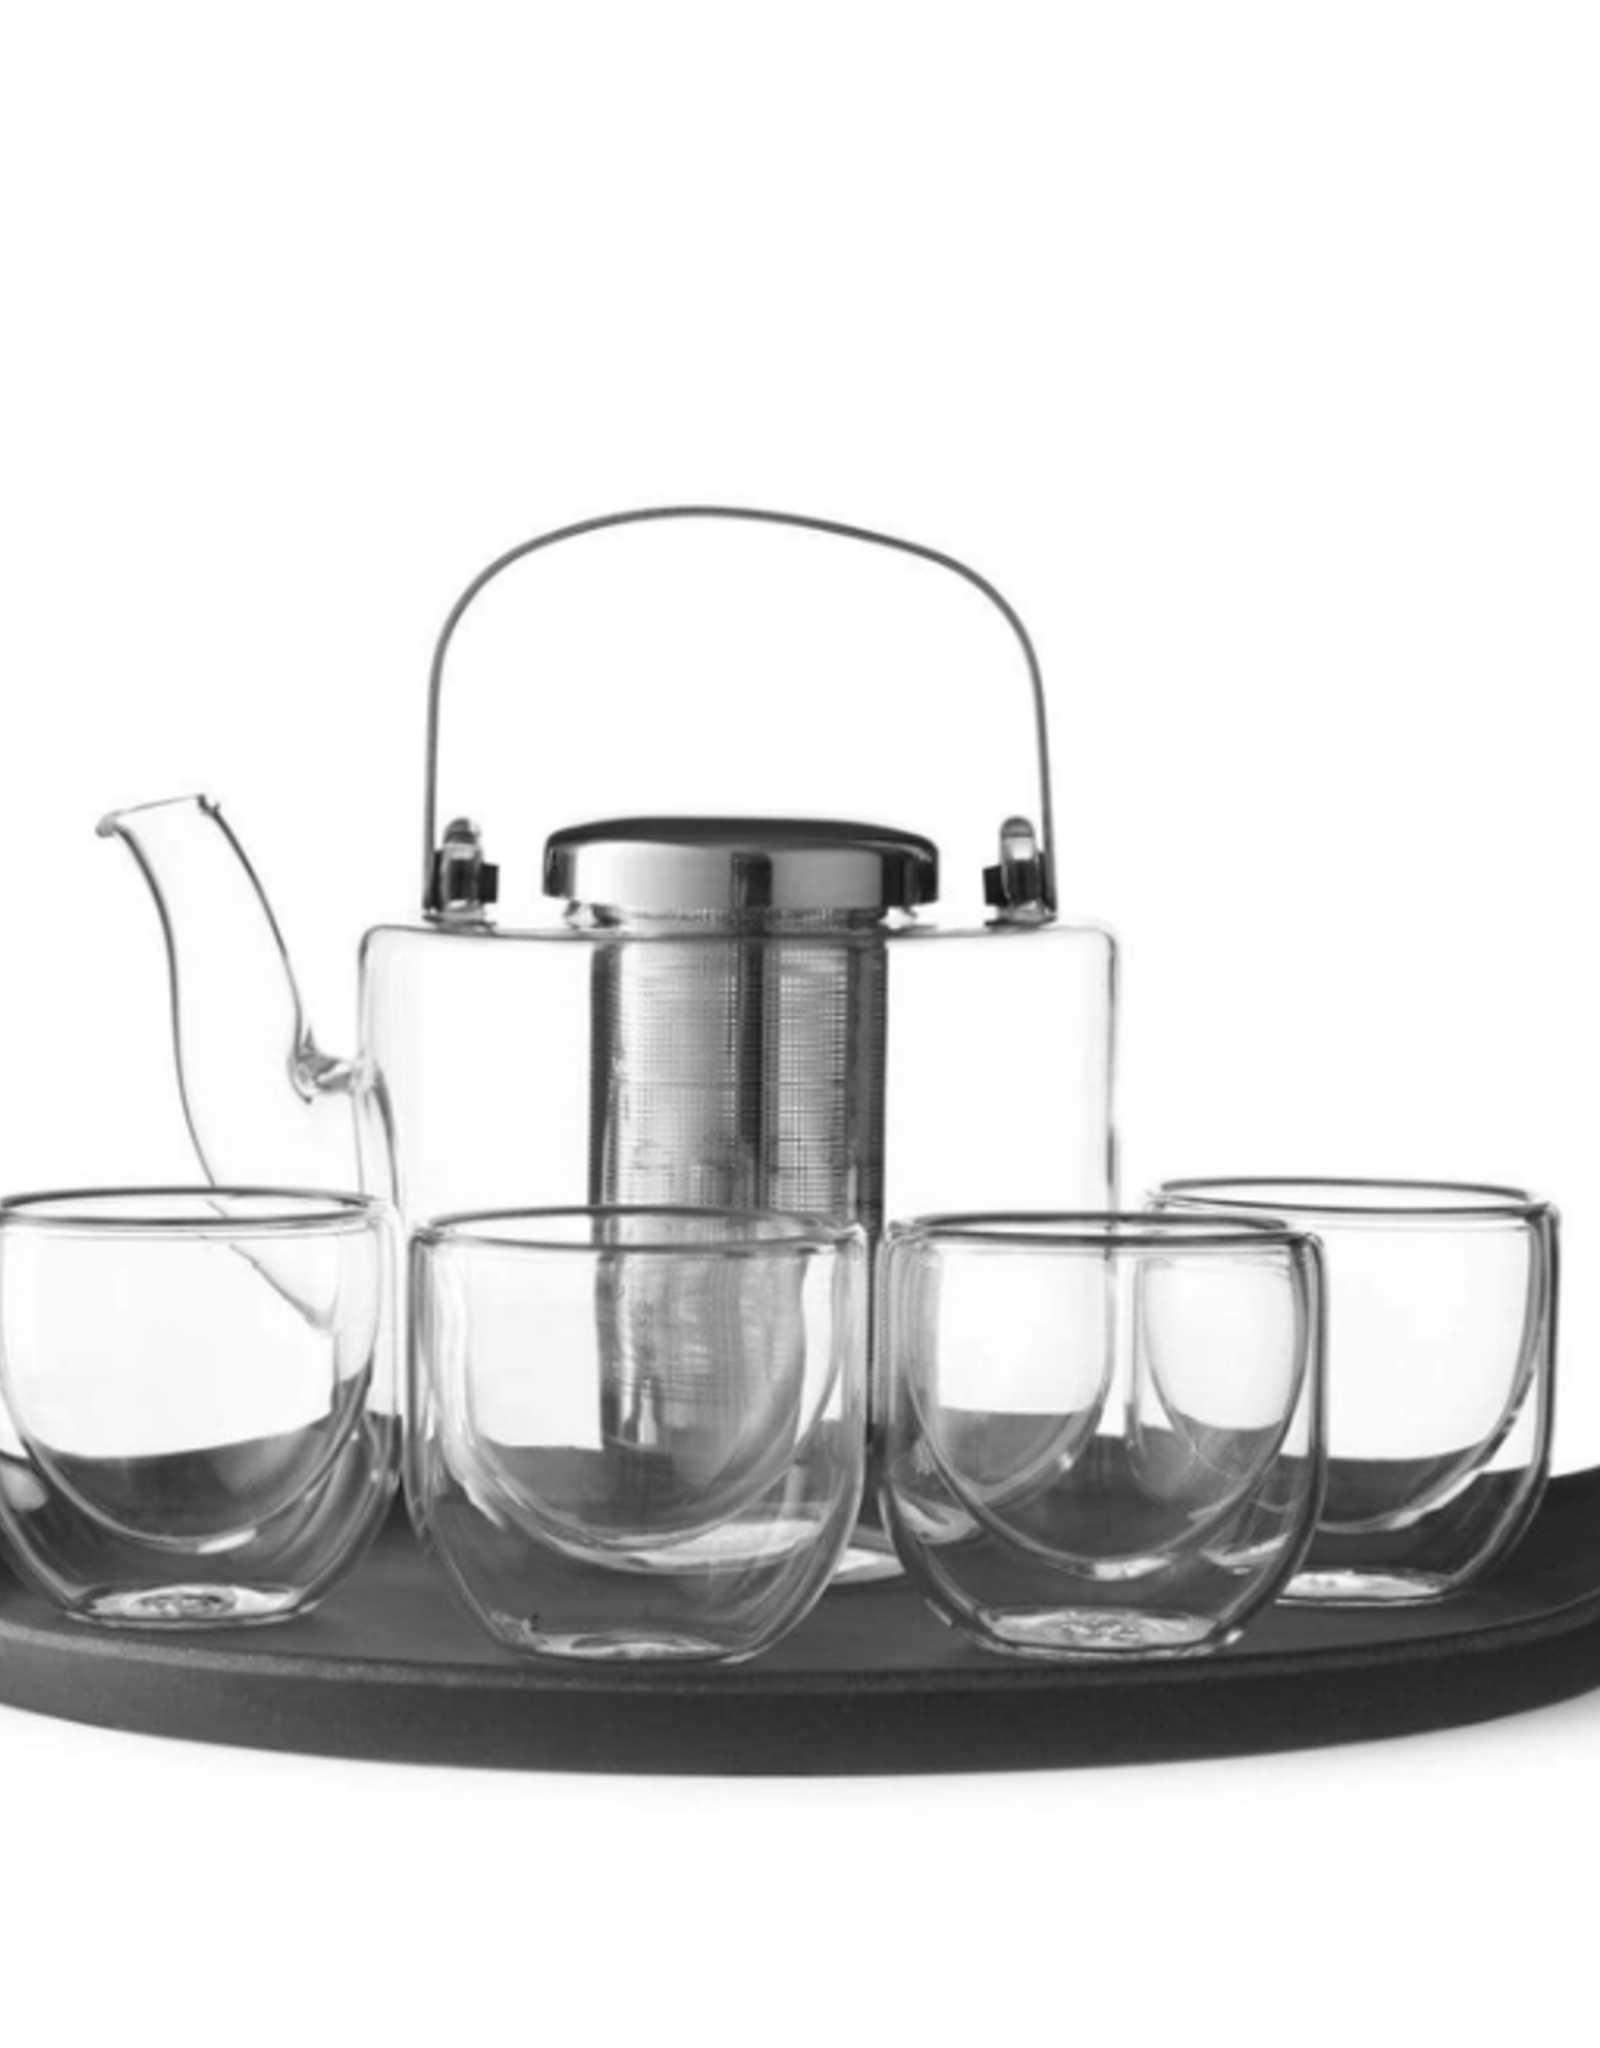 Bjorn Glass Tea Set